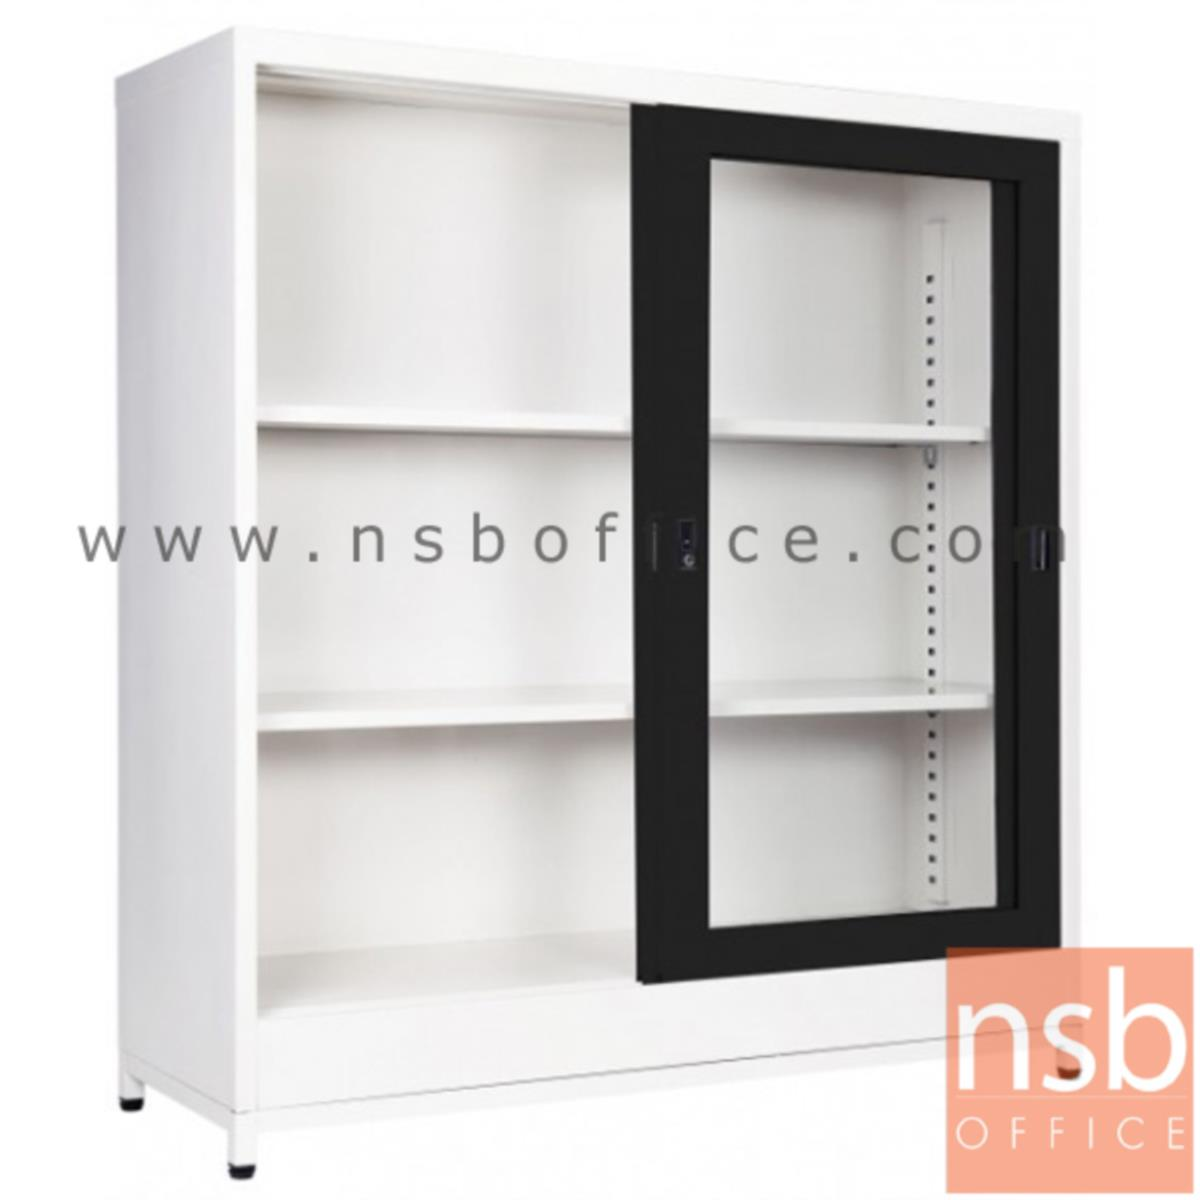 E21A018:ตู้บานเลื่อนกระจก 4 ฟุต สูงพิเศษ 122H cm (พร้อมฐานรองแบบขาลอย)  SGD-120